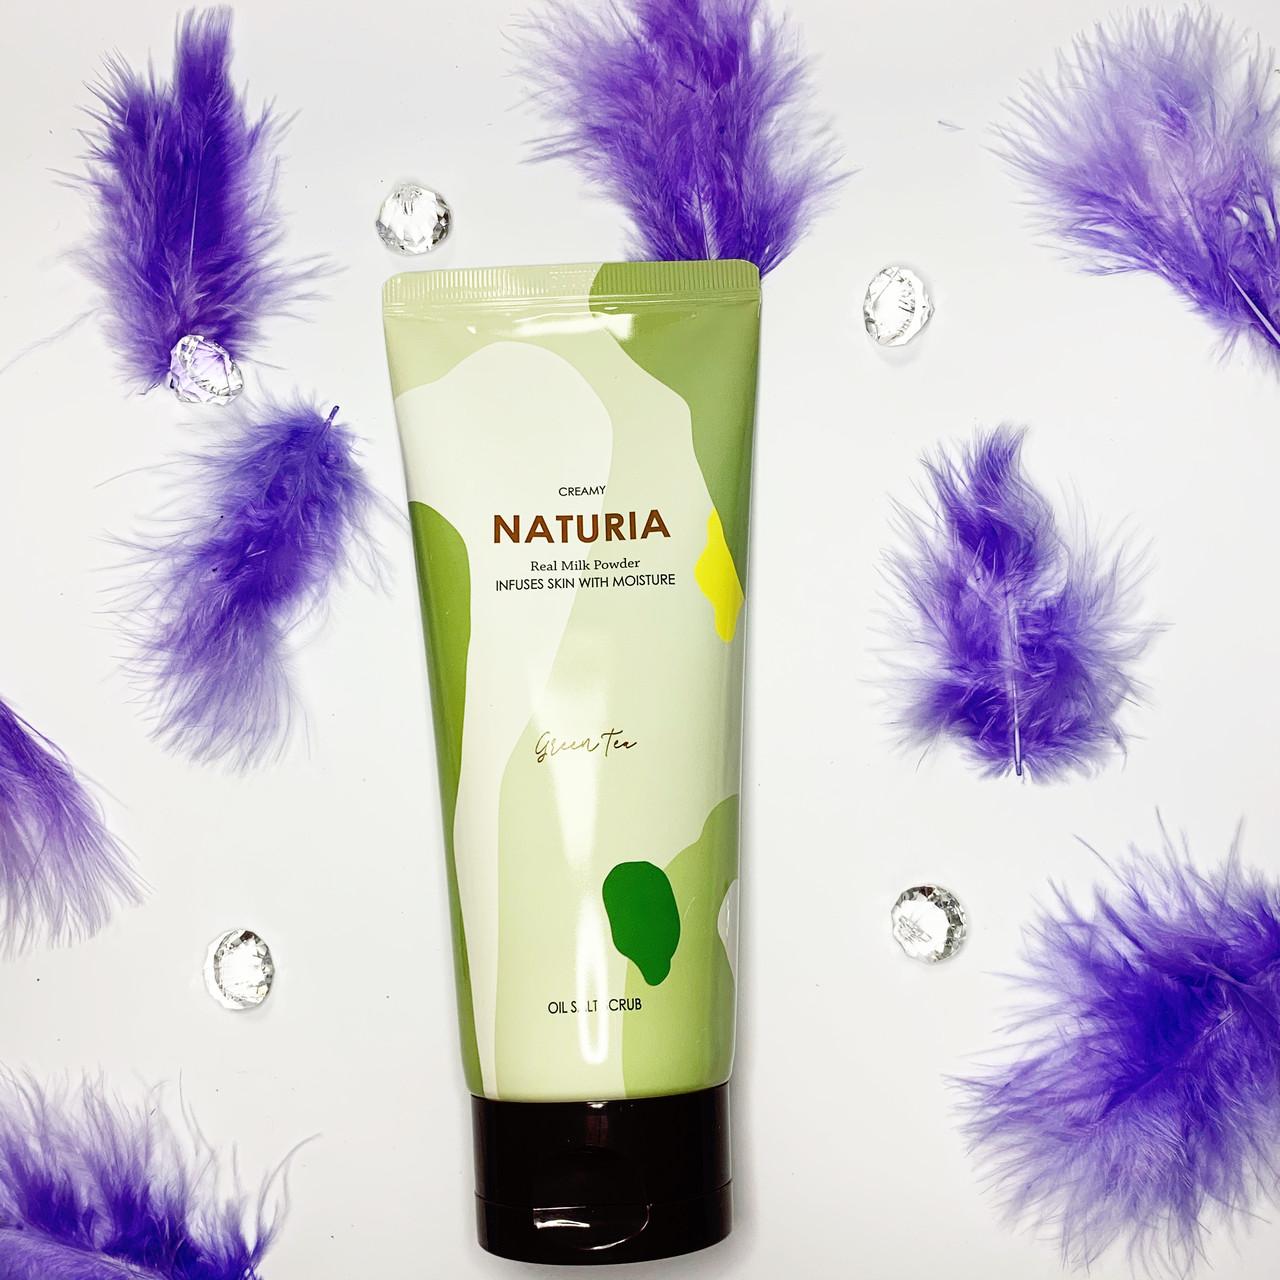 Скраб для тела ЗЕЛЕНЫЙ ЧАЙ Creamy Oil Salt Scrub Green Tea, 250 гр  ТМ NATURIA